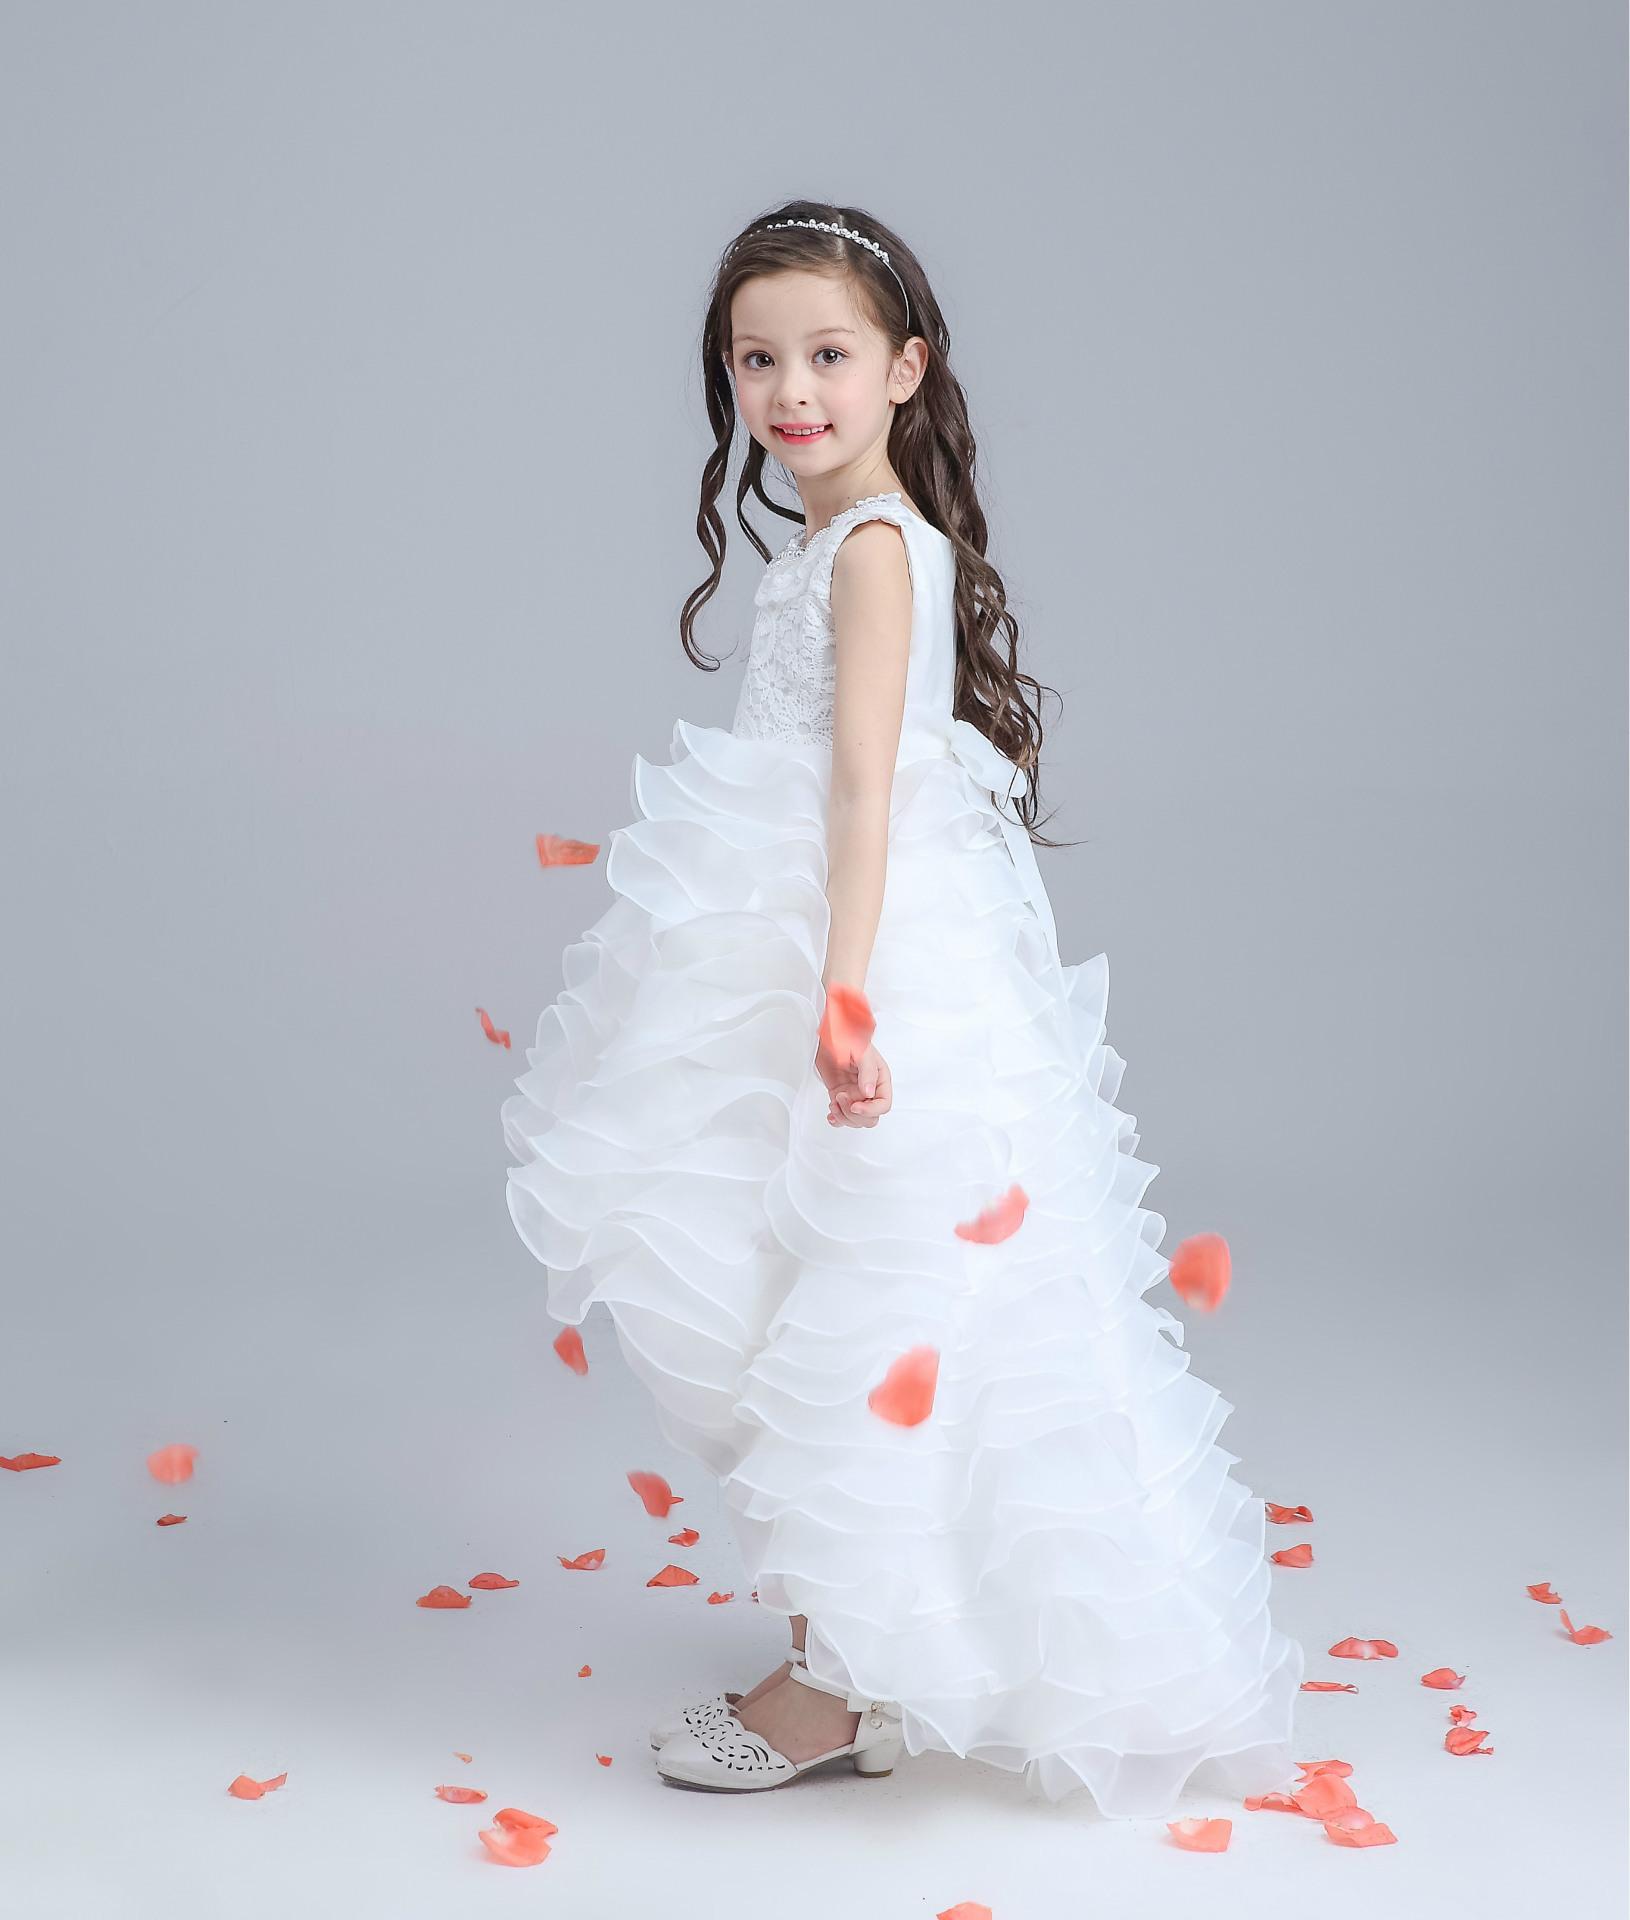 Childrens Discount Flower Girl Dresses - Bridesmaid Dresses